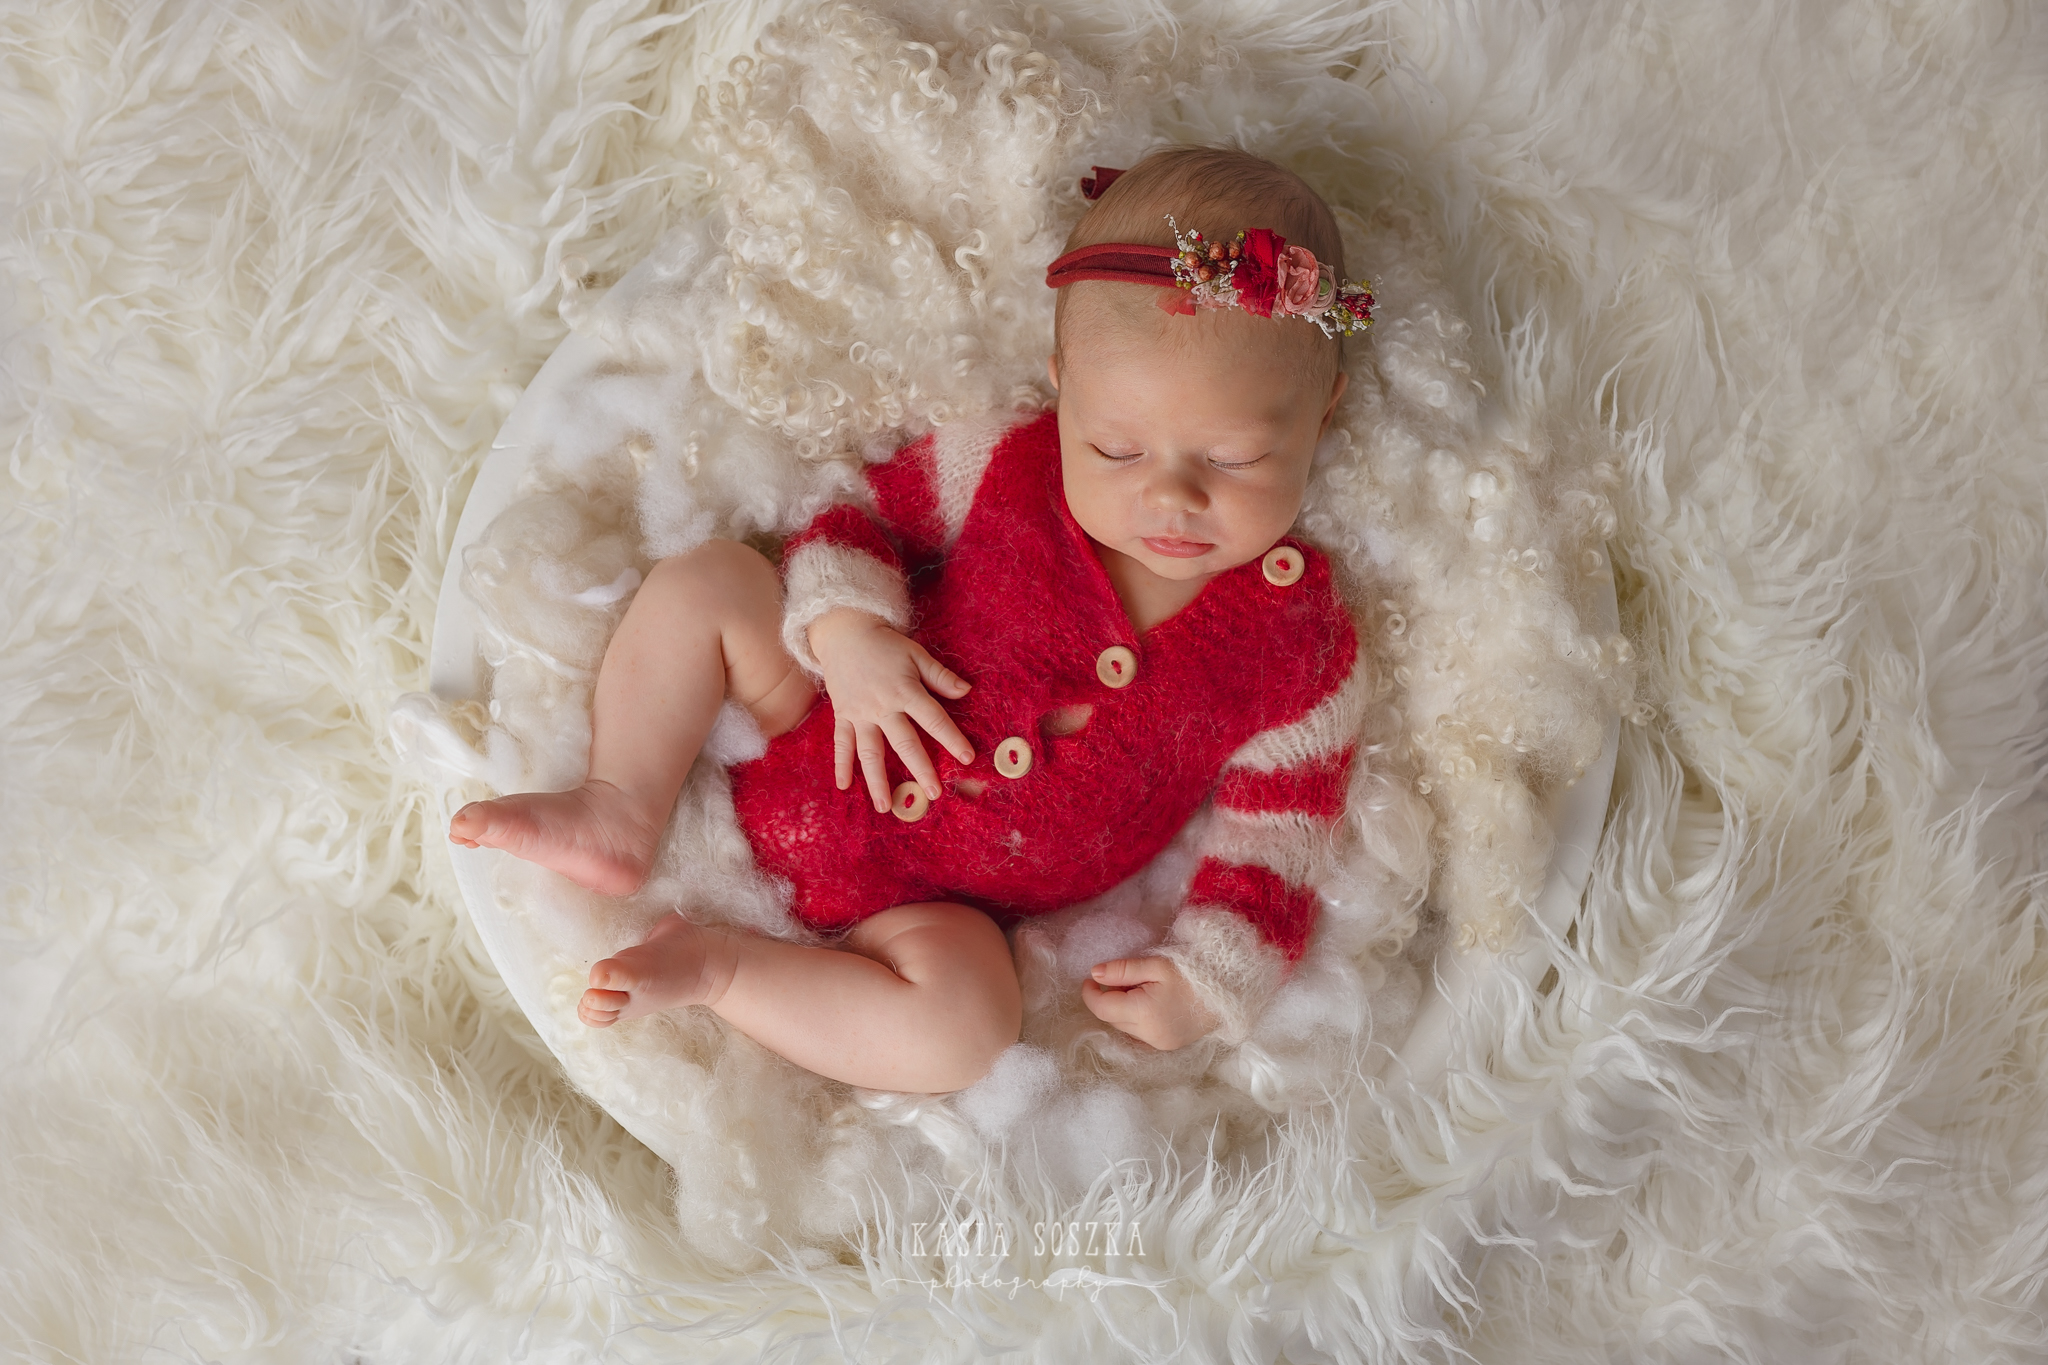 Newborn photography Leeds-York-Bradford-Harrogate: Christmas newborn session in Leeds, Yorkshire. Cute newborn baby girl in Christmas outfit